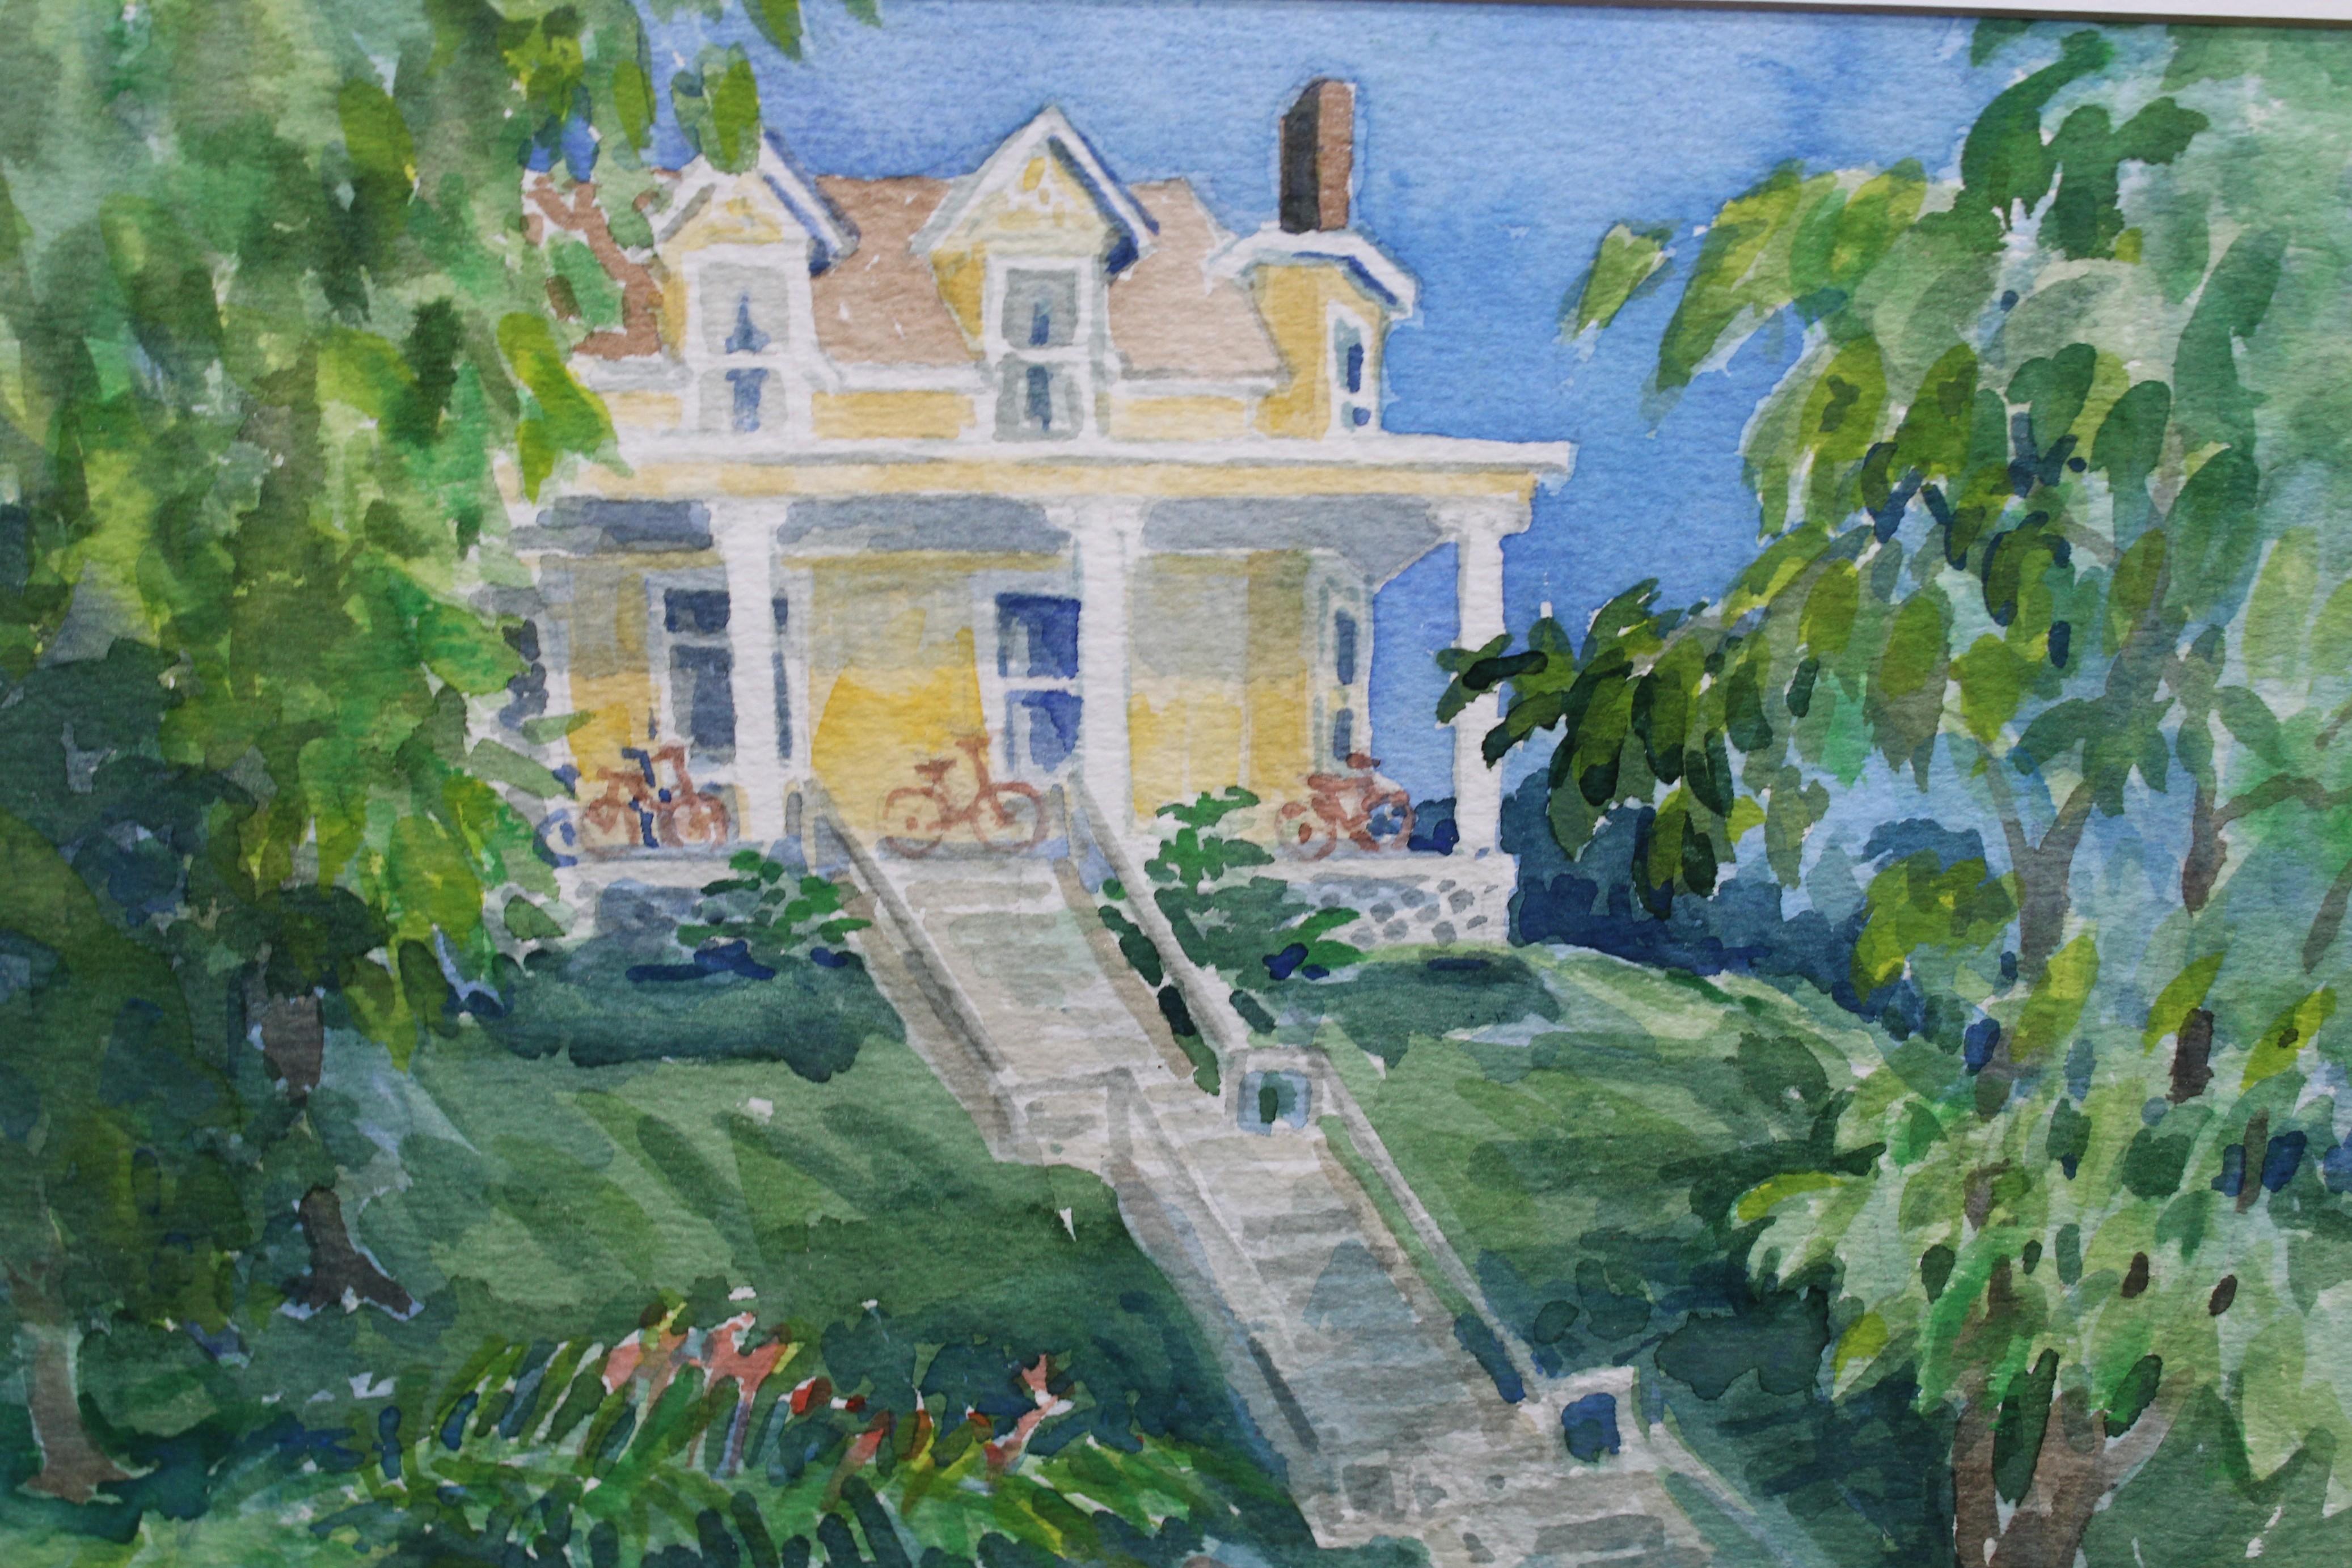 Lot 283 - (4) Framed American School Watercolors of Houses